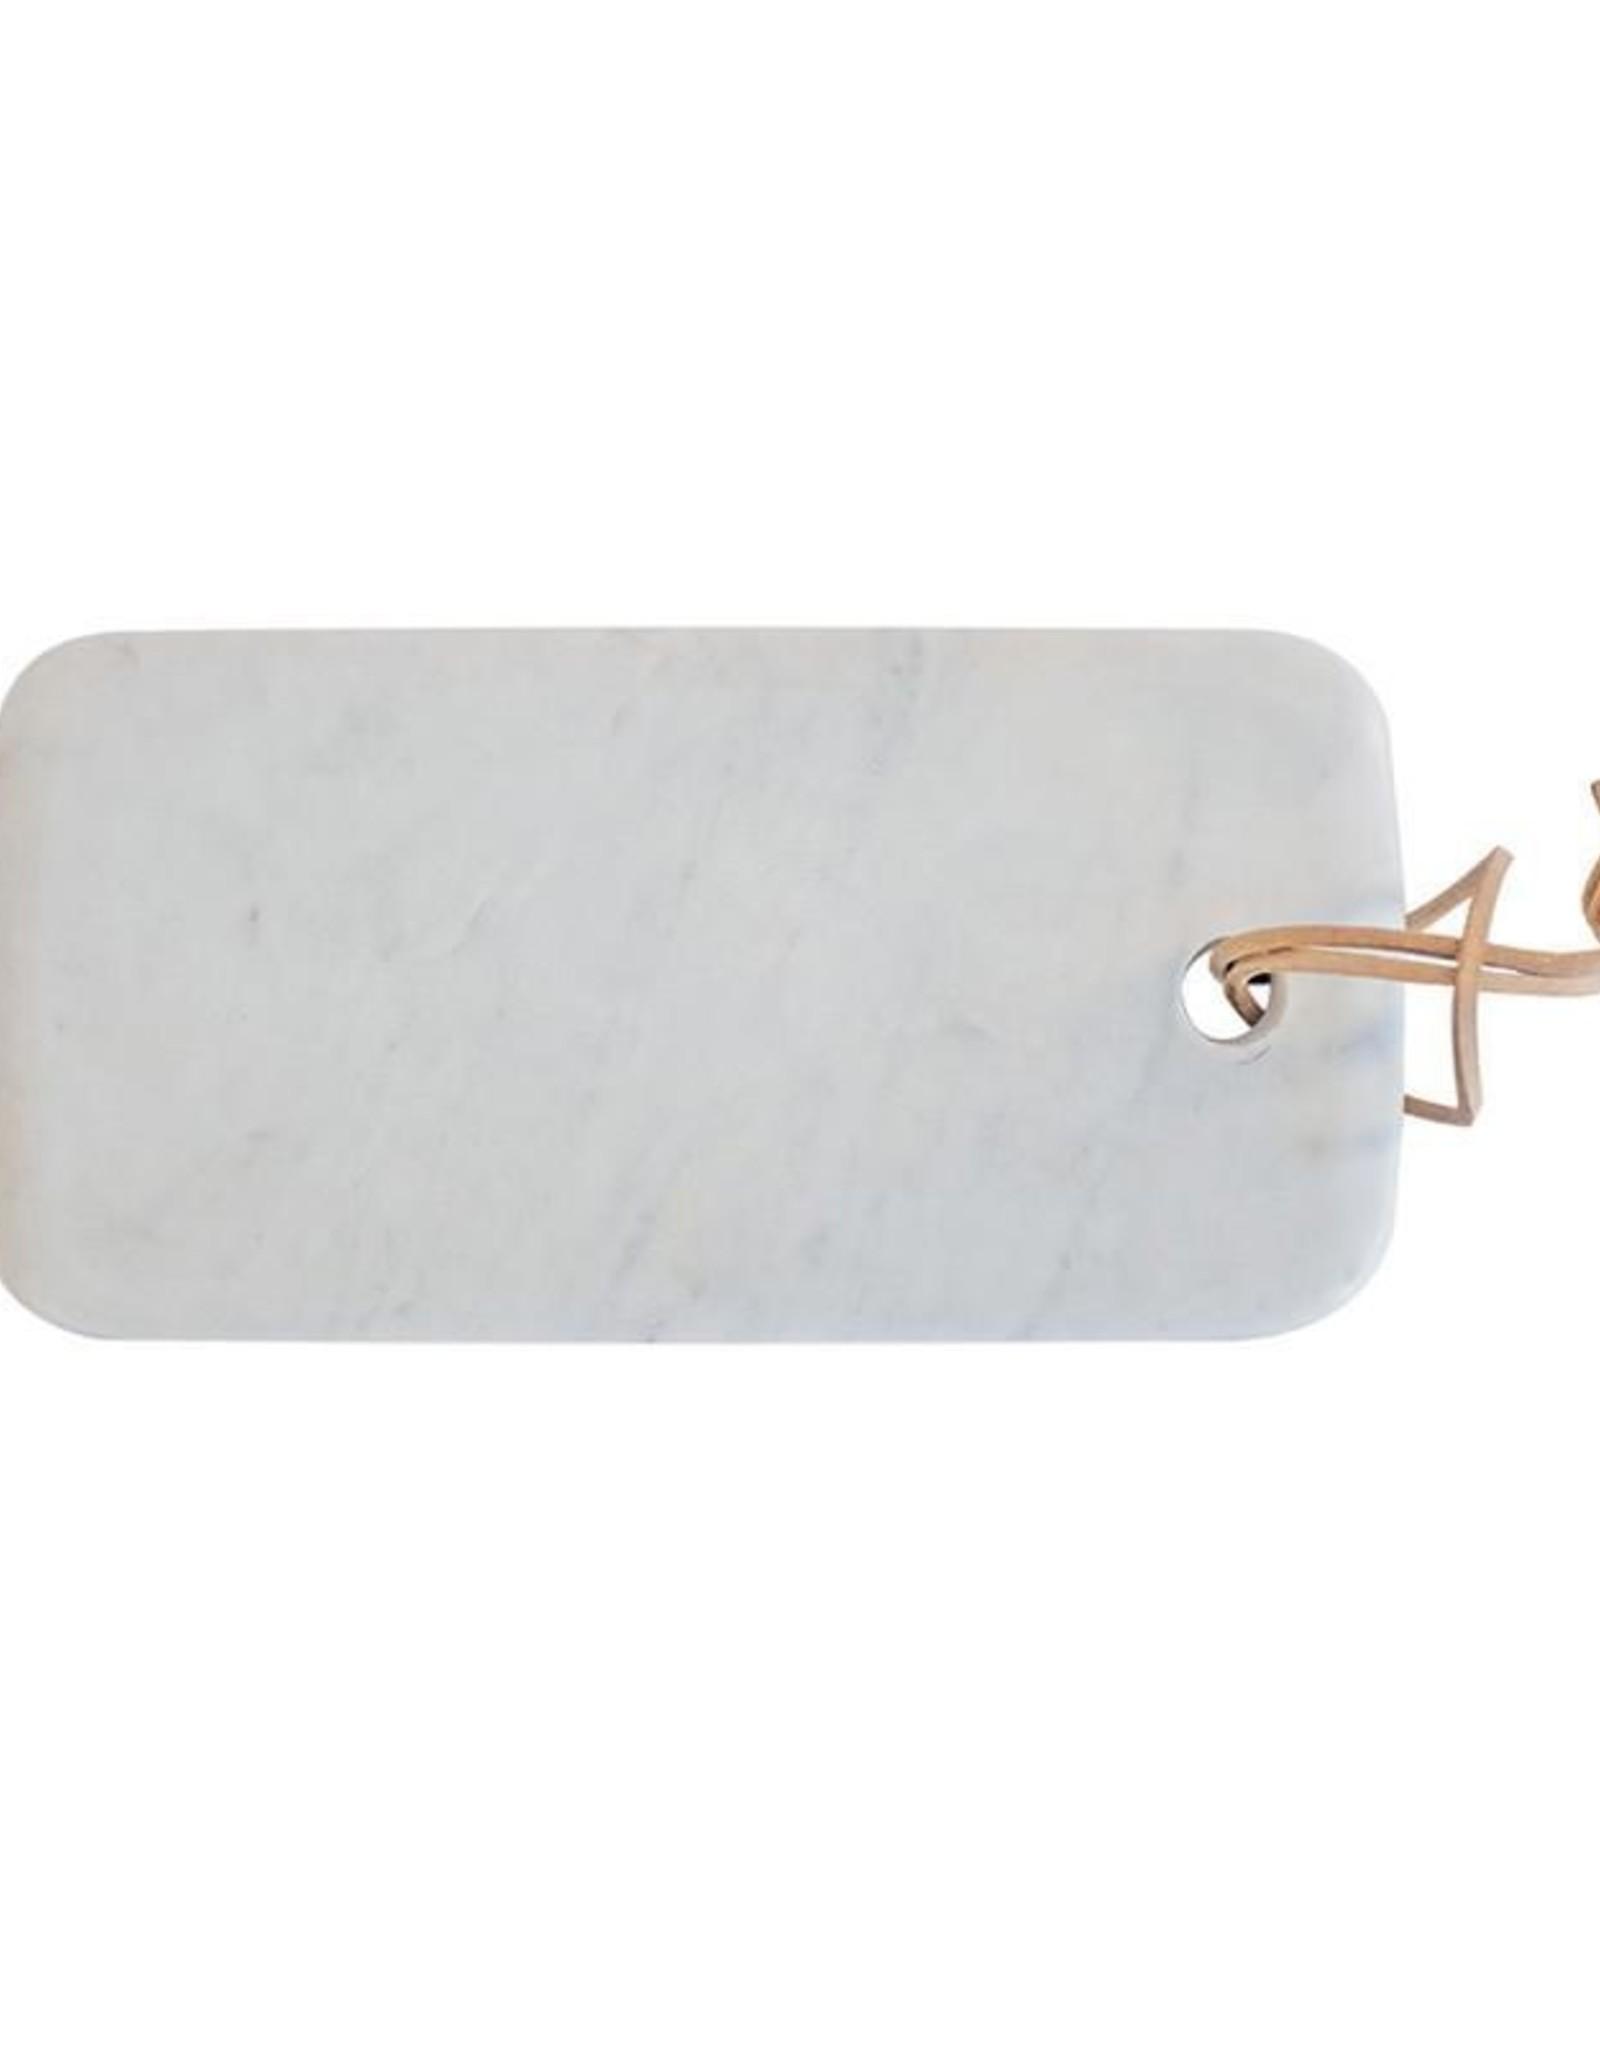 Caravan Home Small Marble Cheese Board